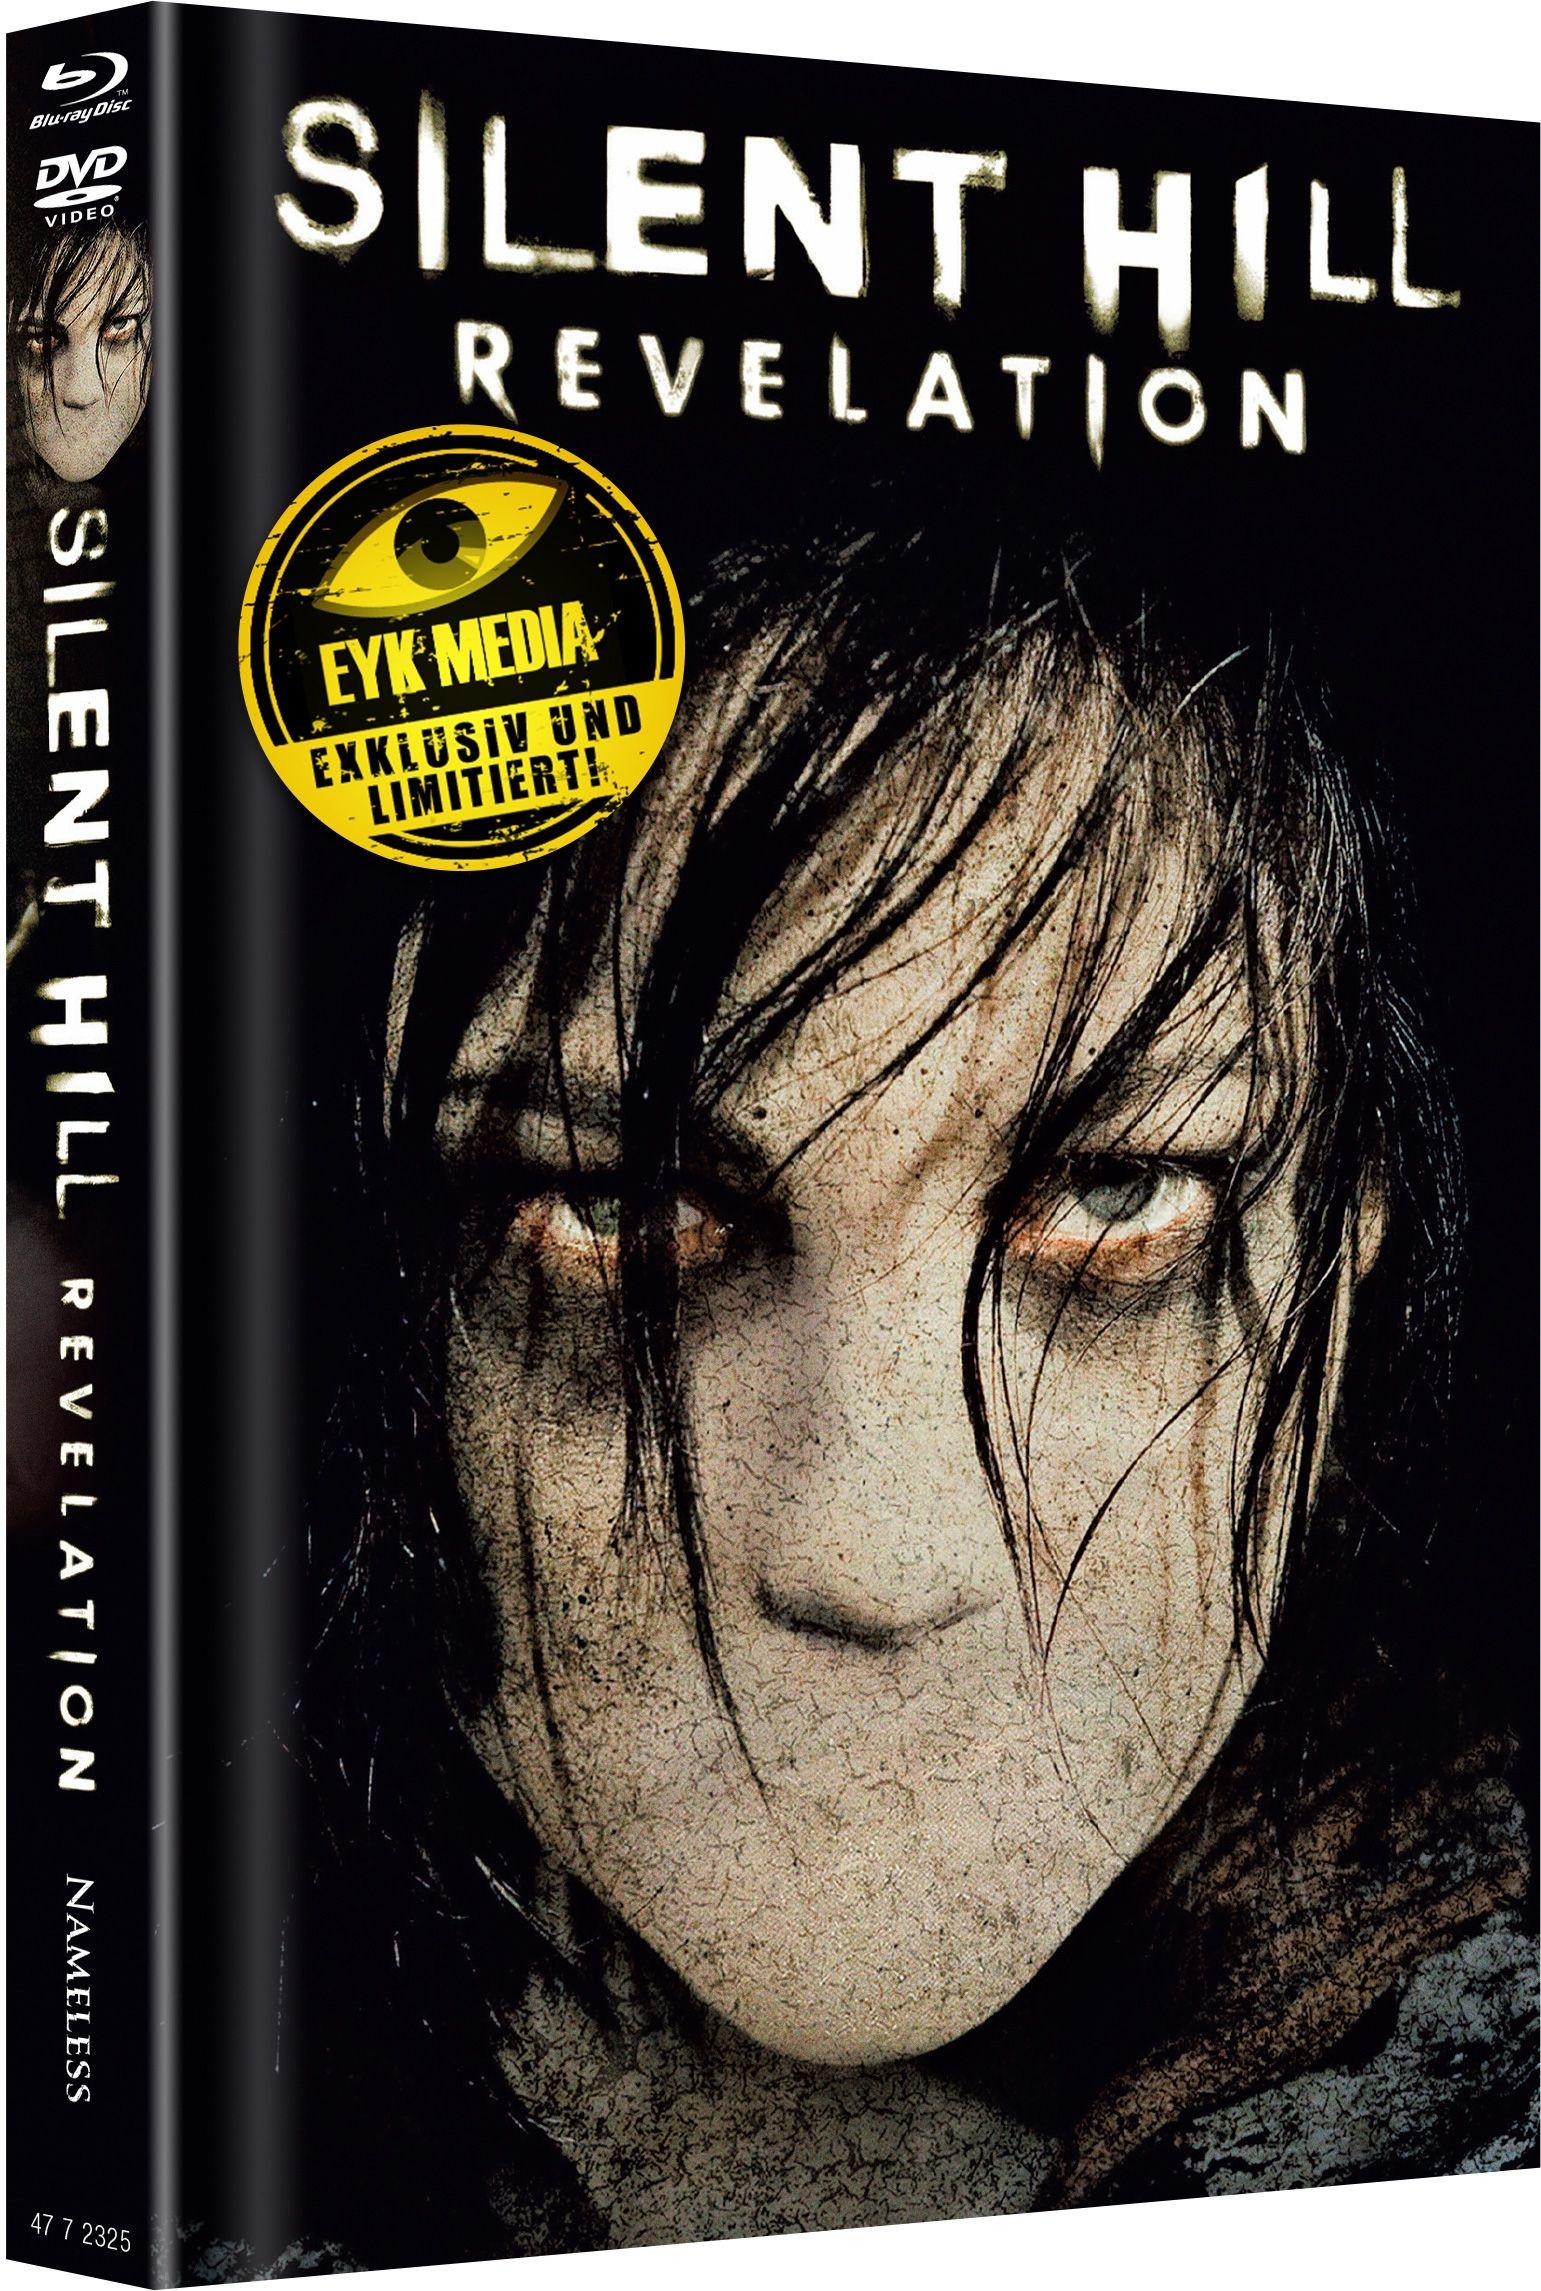 Silent Hill - Revelation (Lim. Uncut Mediabook - Cover B) (DVD + BLURAY)